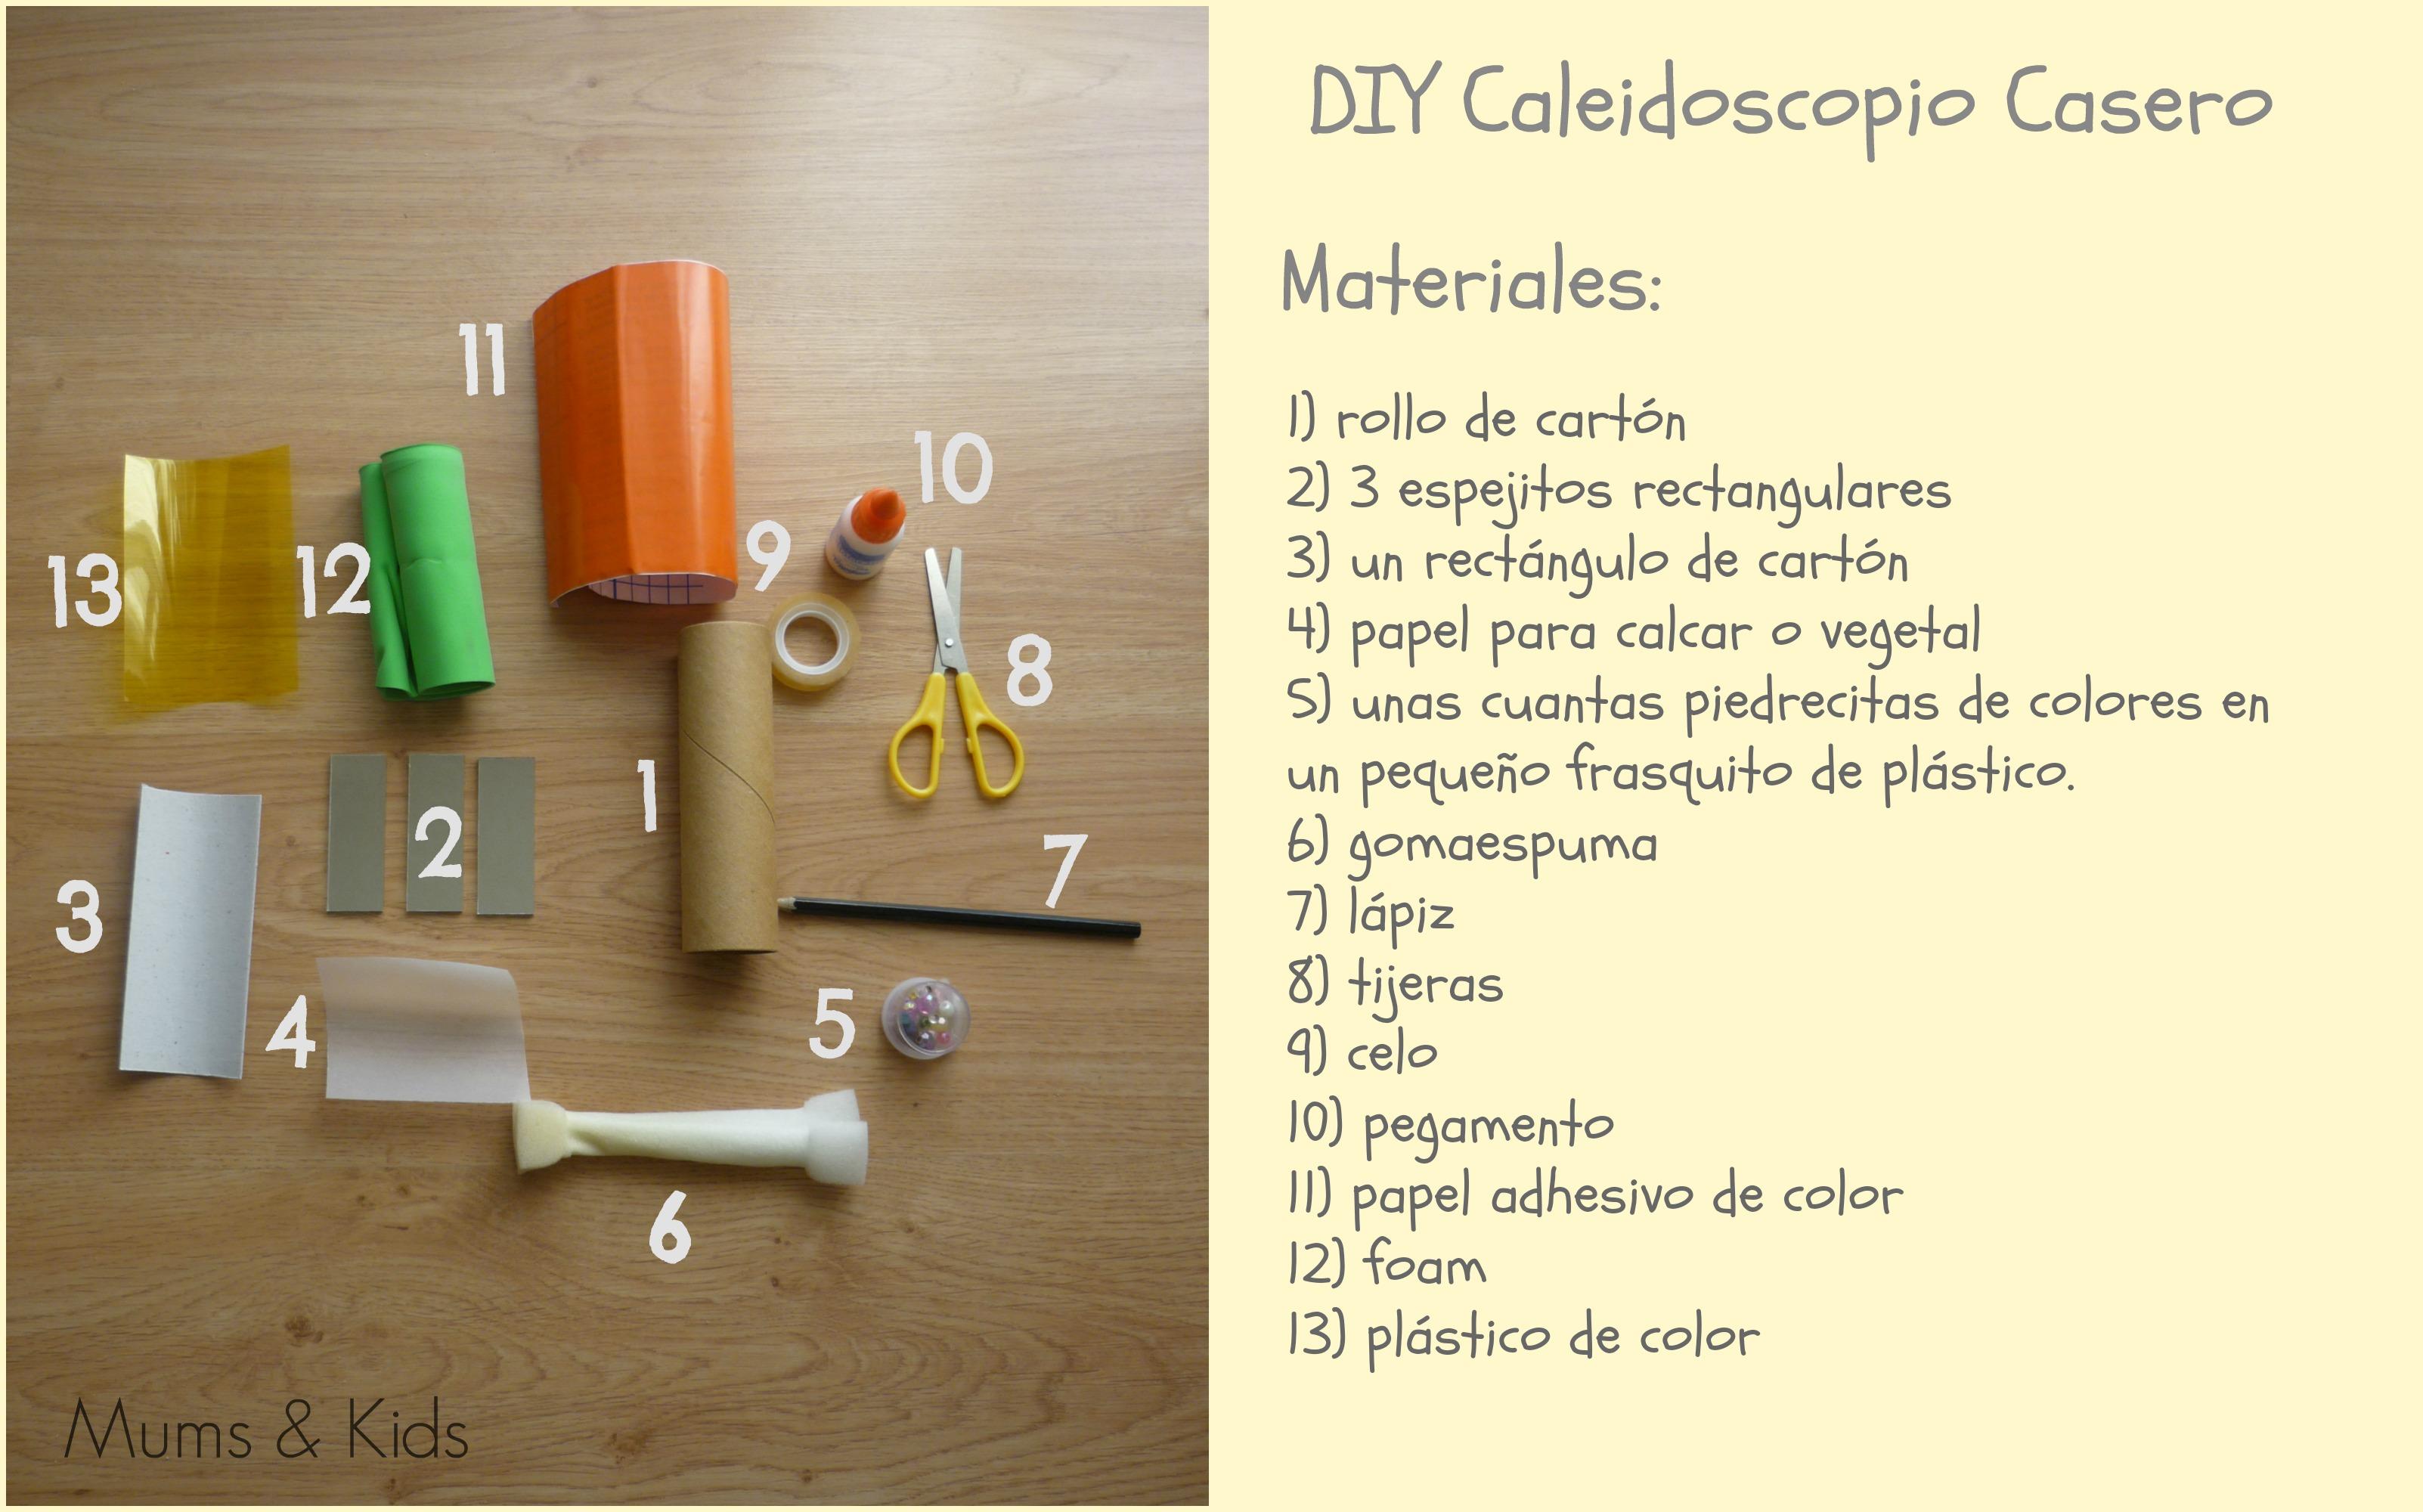 Diy caleidoscopio casero mums kids for Como construir piletas de material